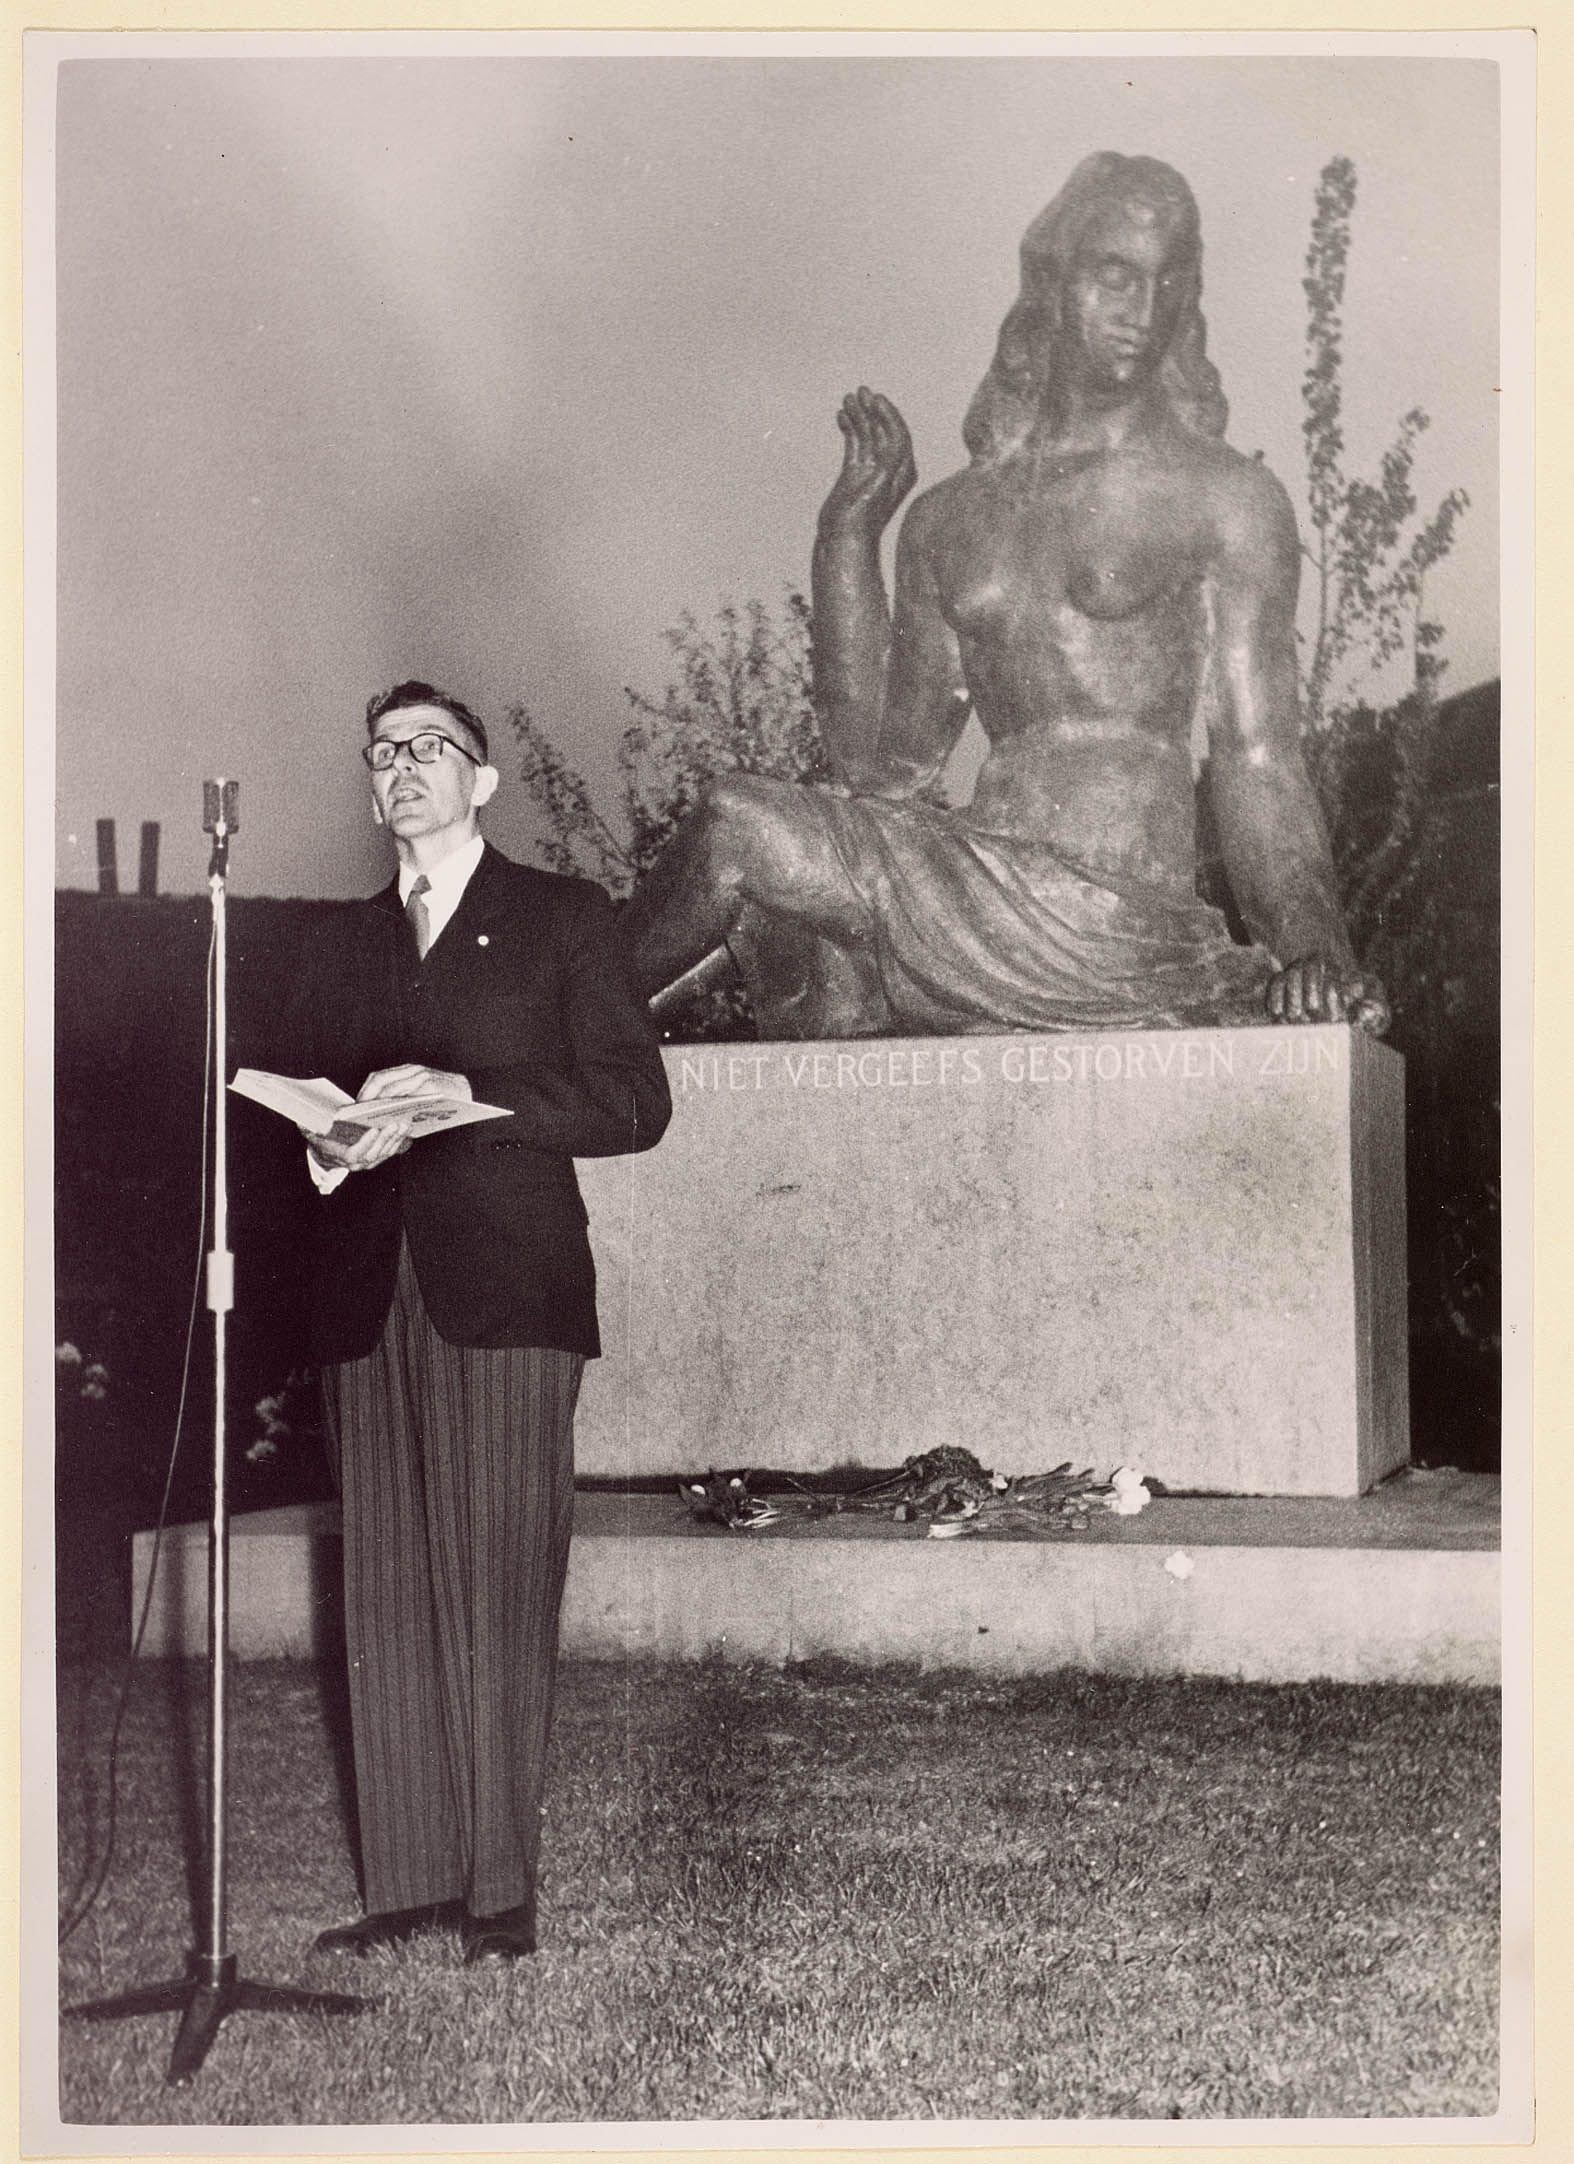 burgemeester-thomassen-van-zaandam-4-mei-1949-2208273